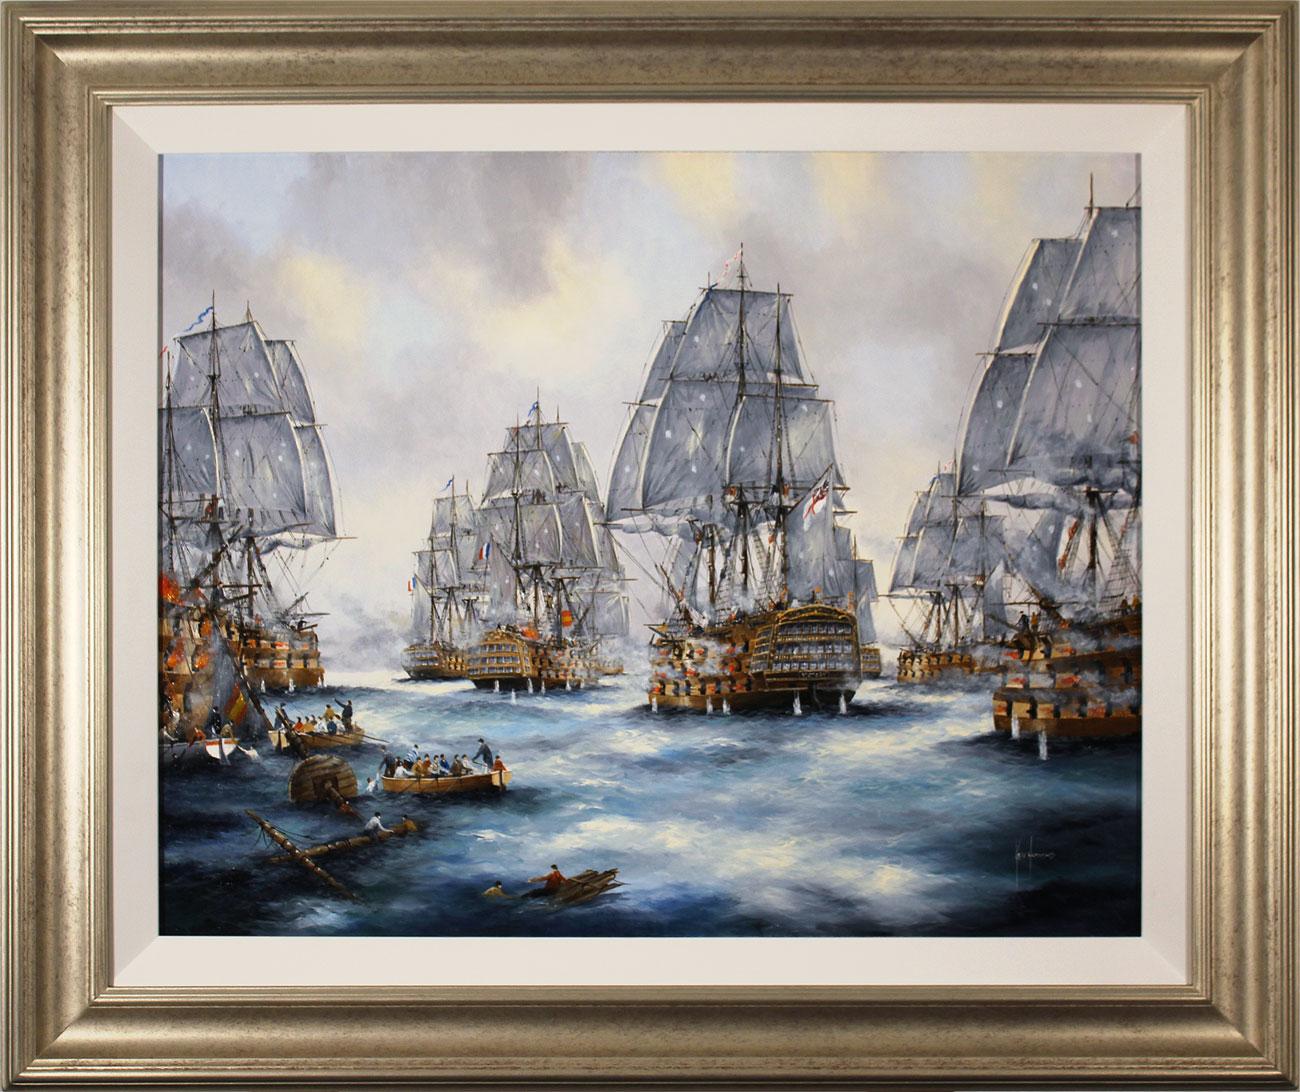 Ken Hammond, Original oil painting on canvas, Battle of Trafalgar Click to enlarge